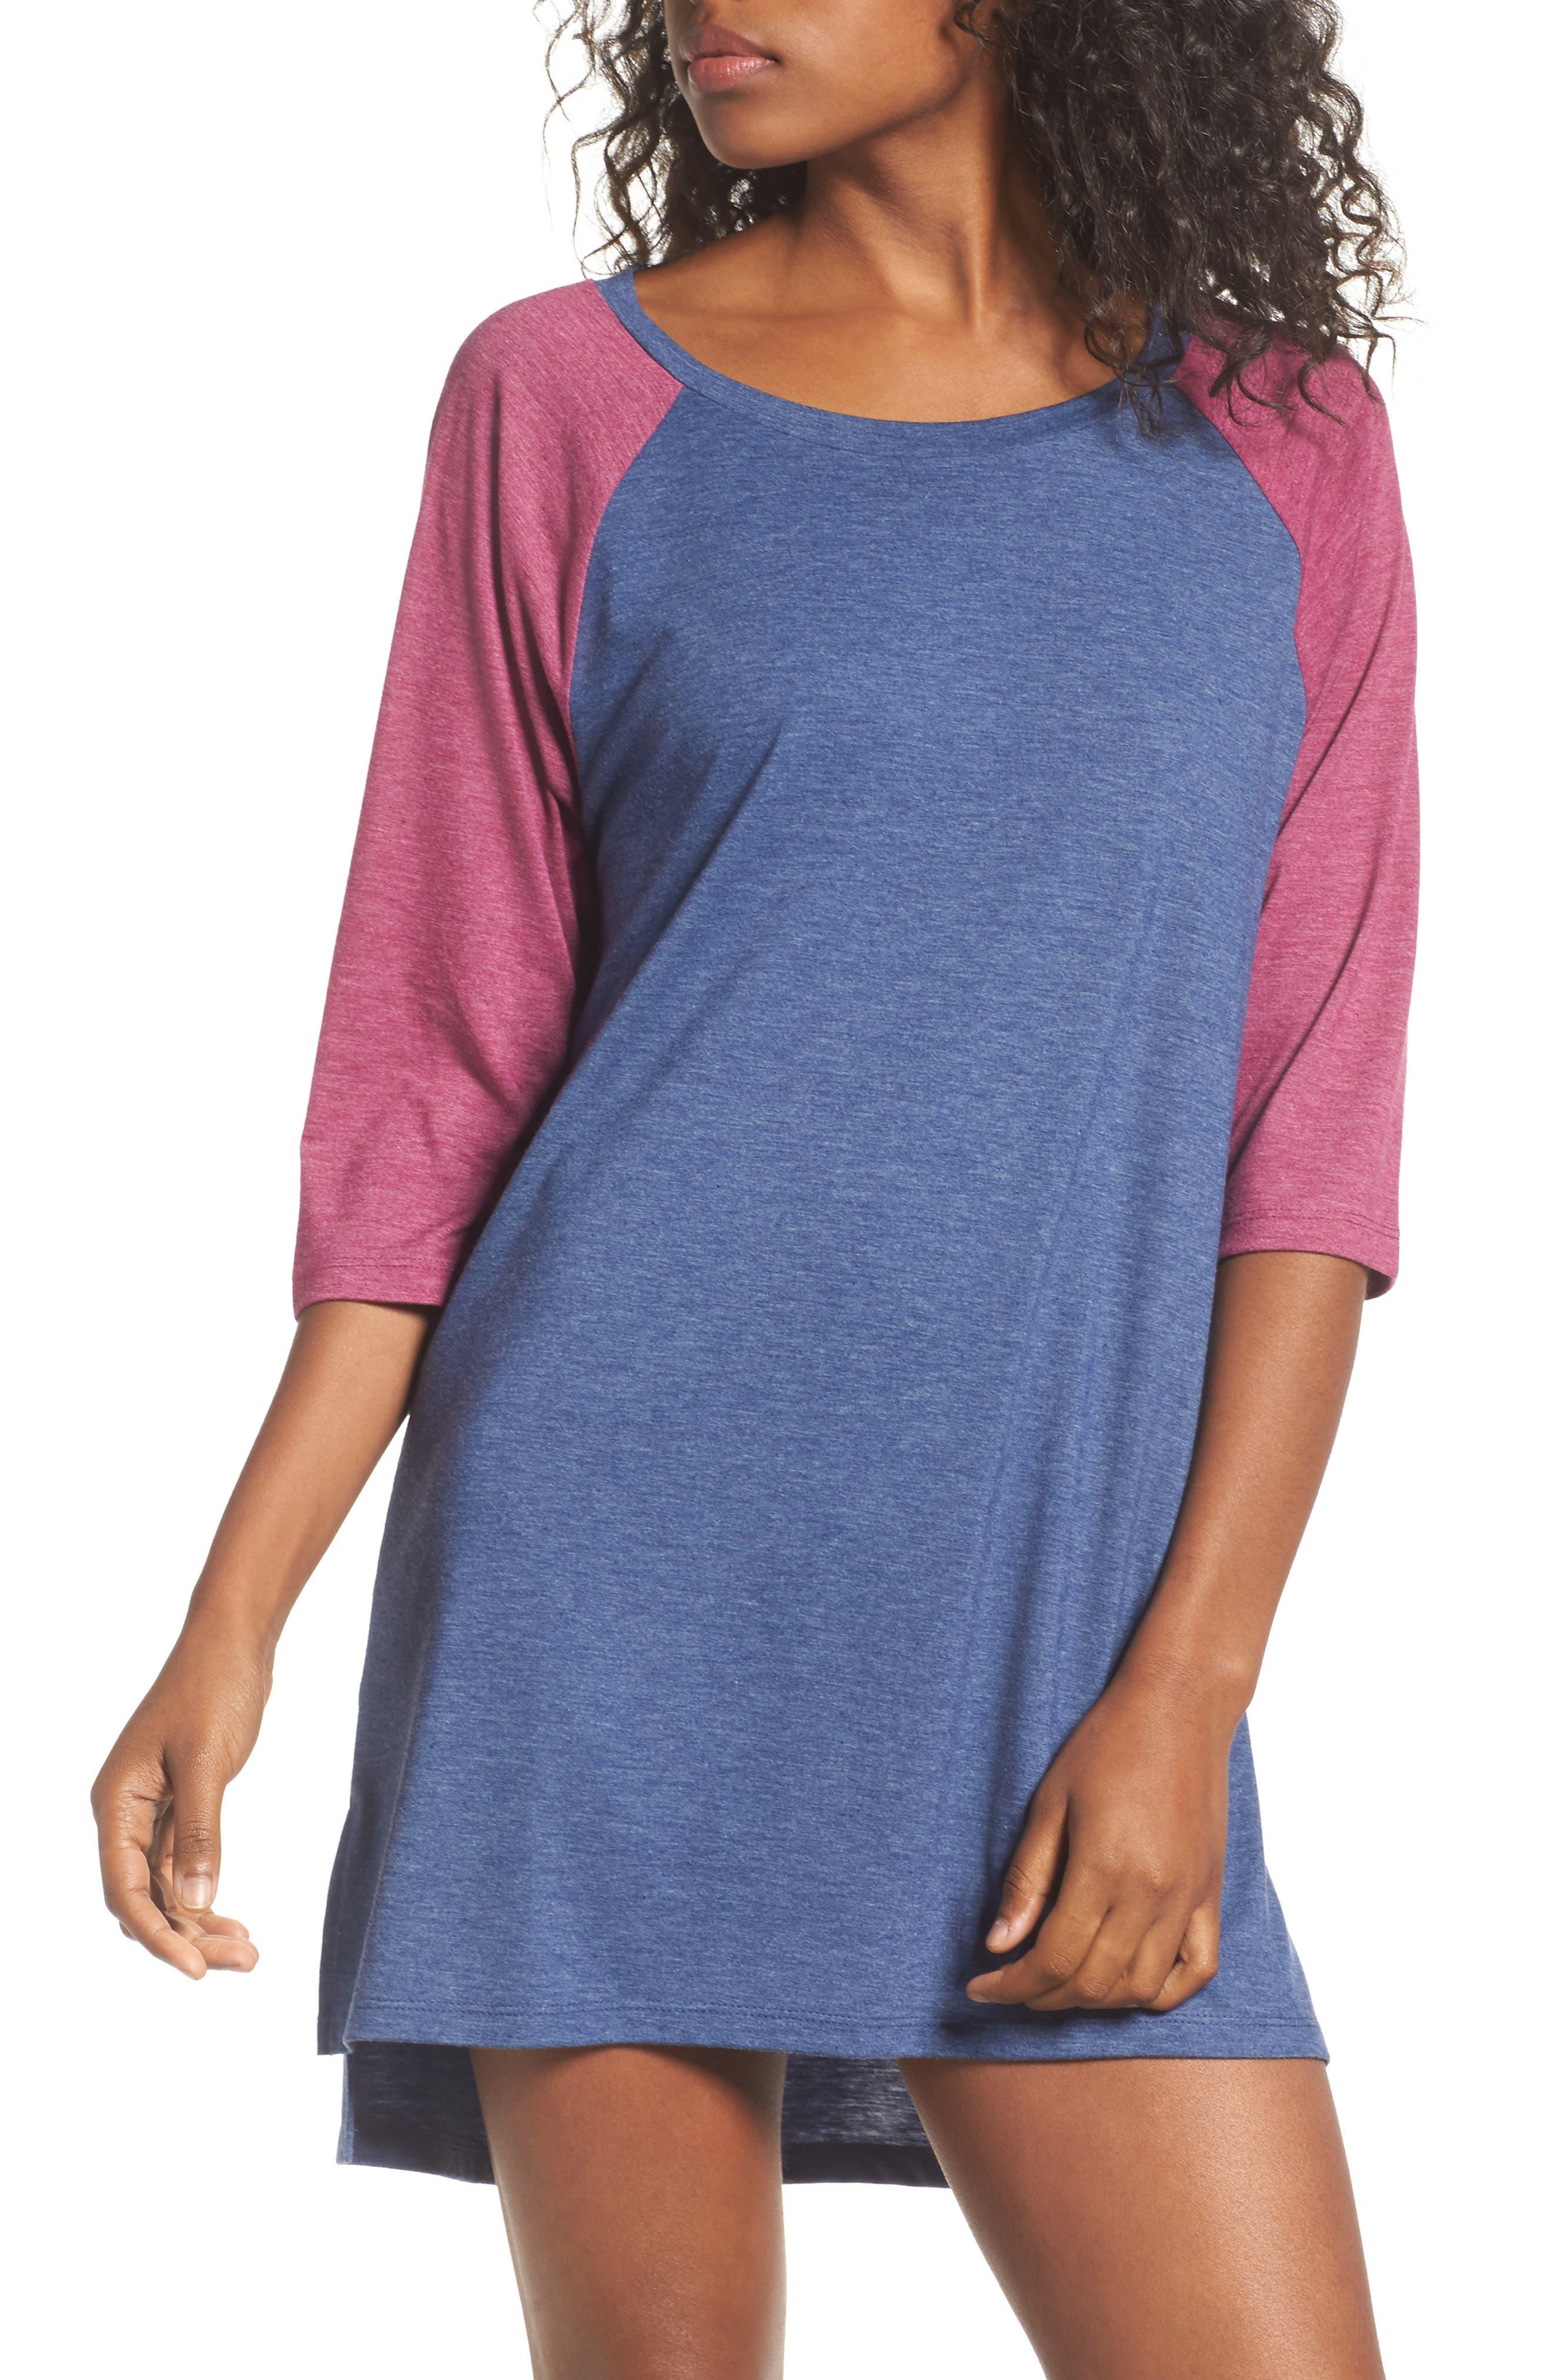 Honeydew All American Sleep Shirt,                             Main thumbnail 5, color,